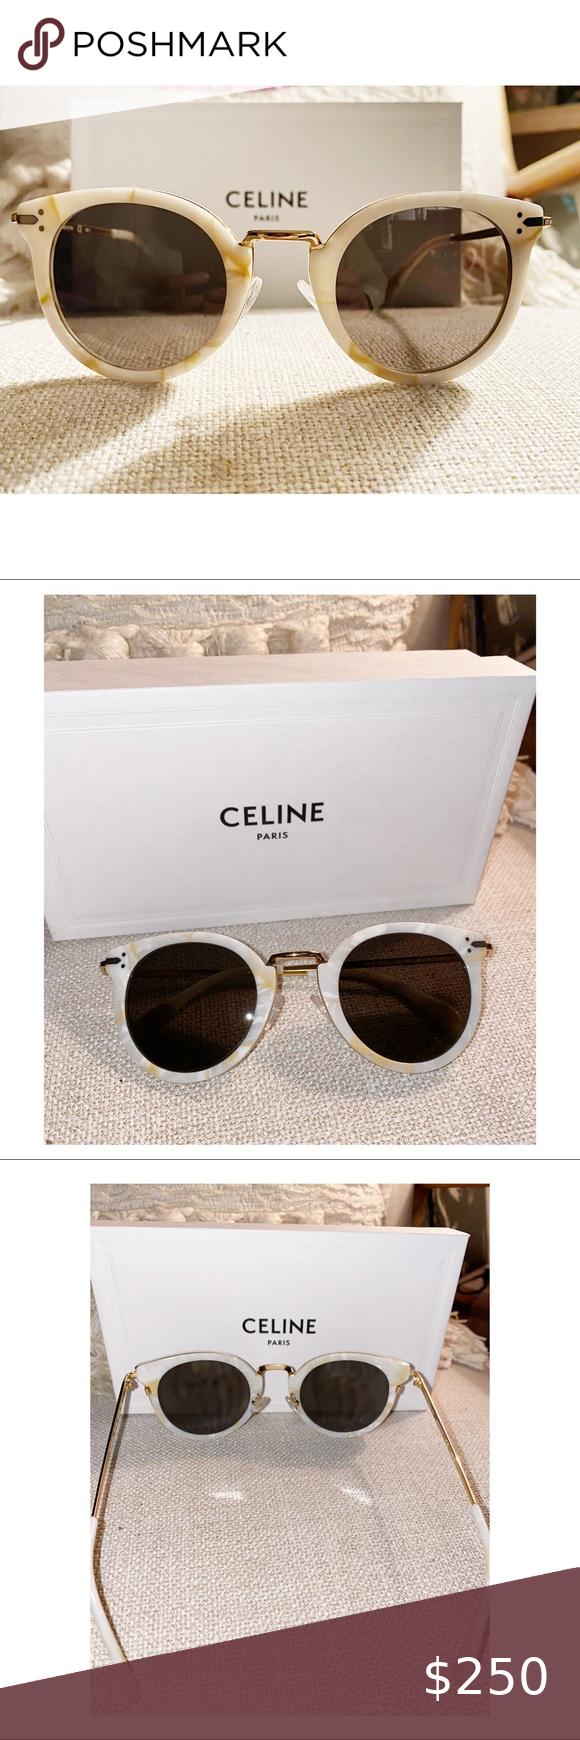 Celine white & gold sunglasses